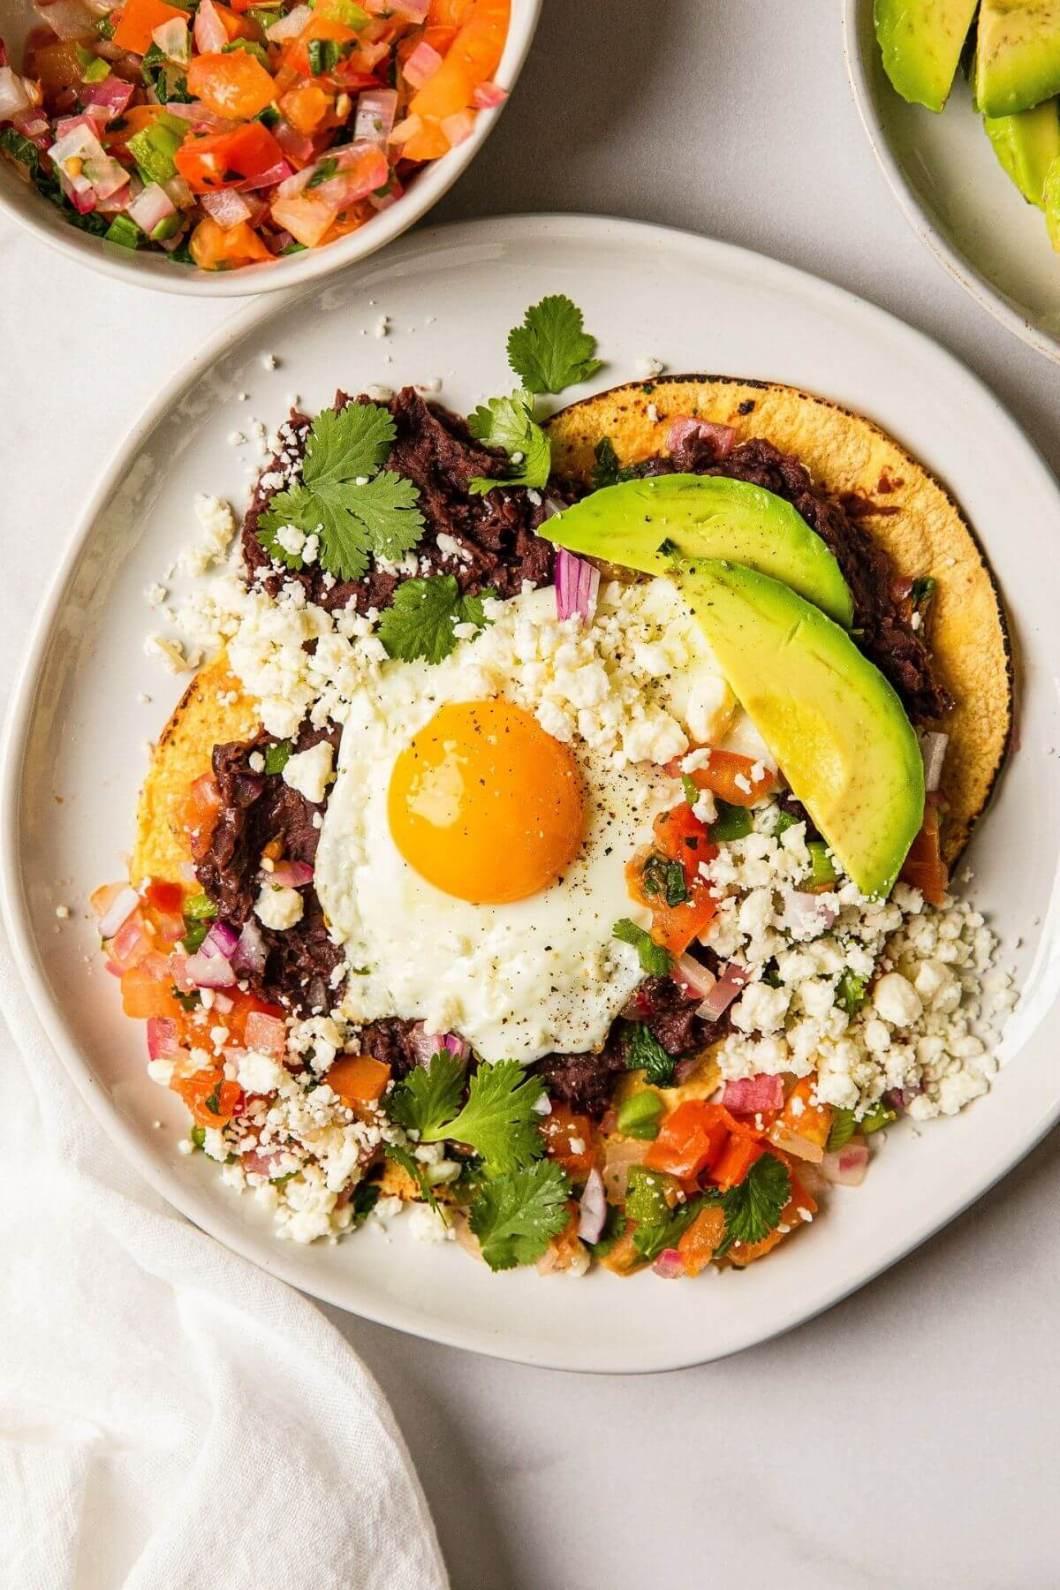 Best huevos rancheros with sunny side up egg on corn tortilla